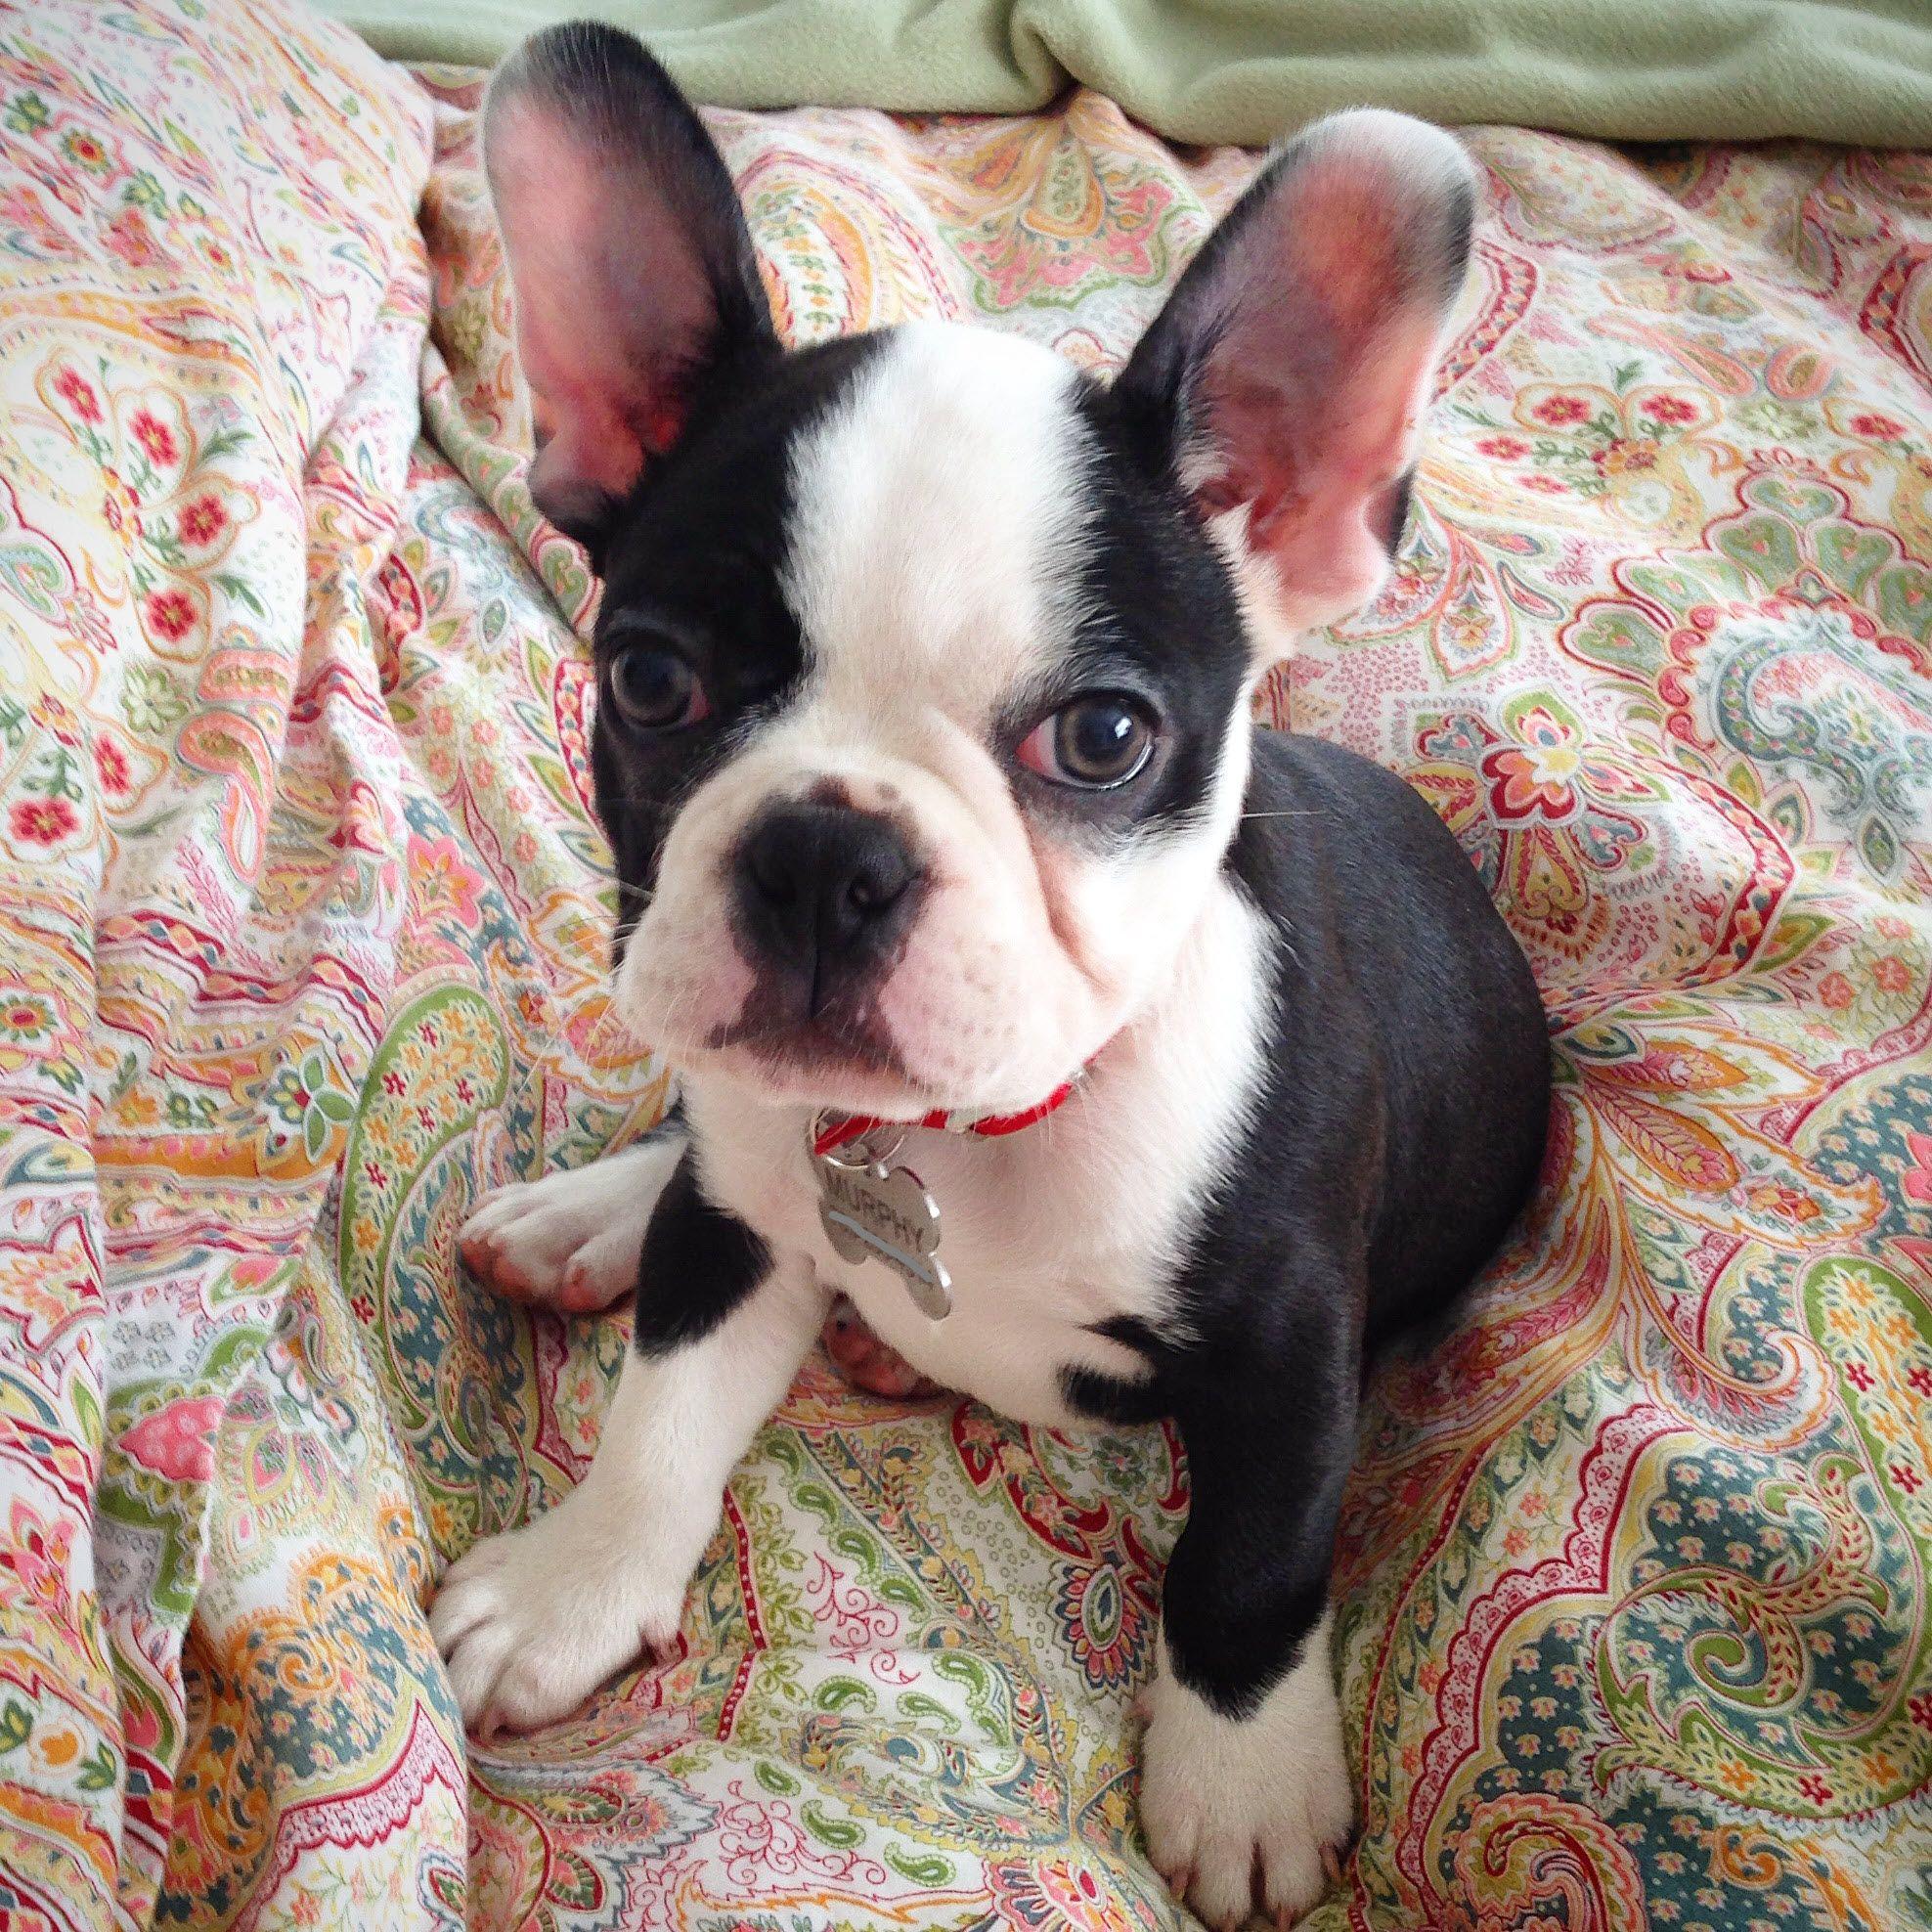 Frenchton Puppy Murphymcmurpherson On Ig Hybrid Dogs French Bulldog Mix Dogs